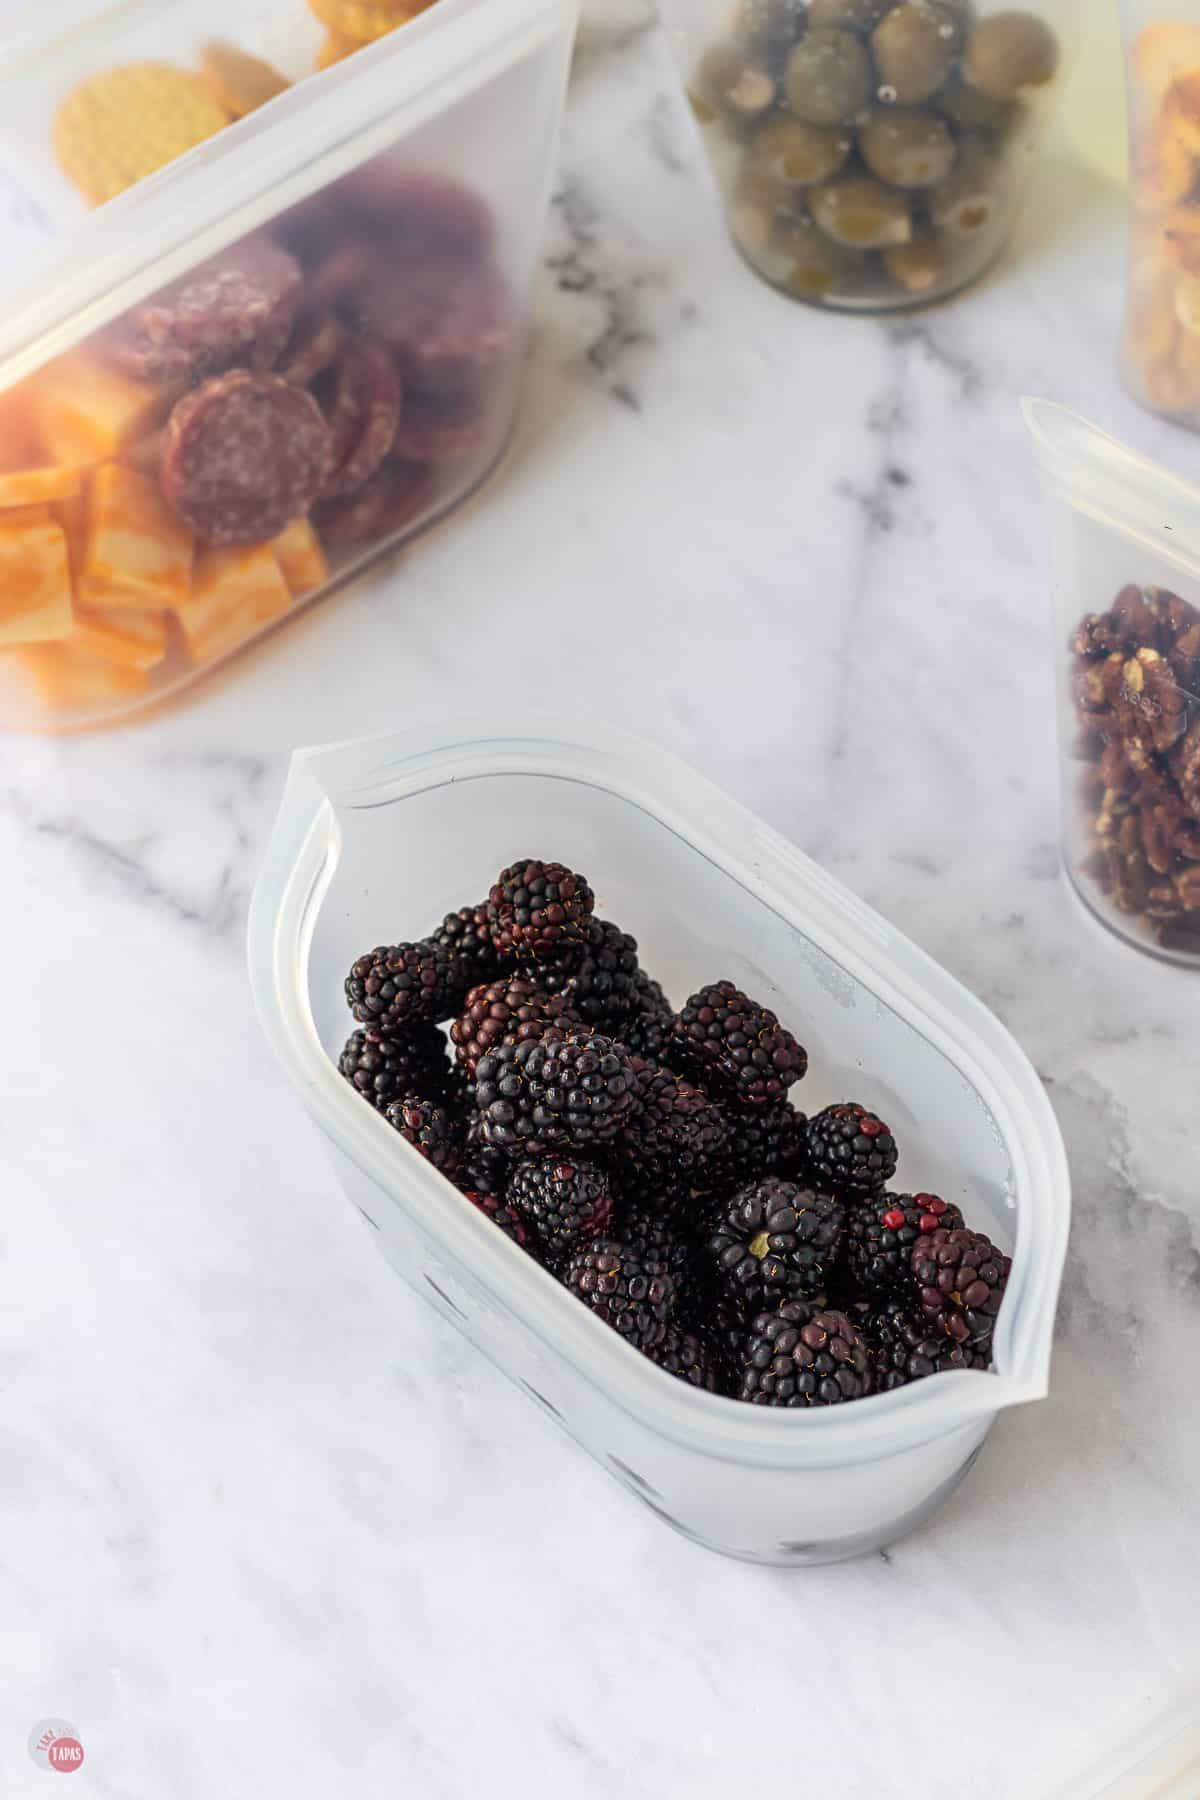 container of blackberries